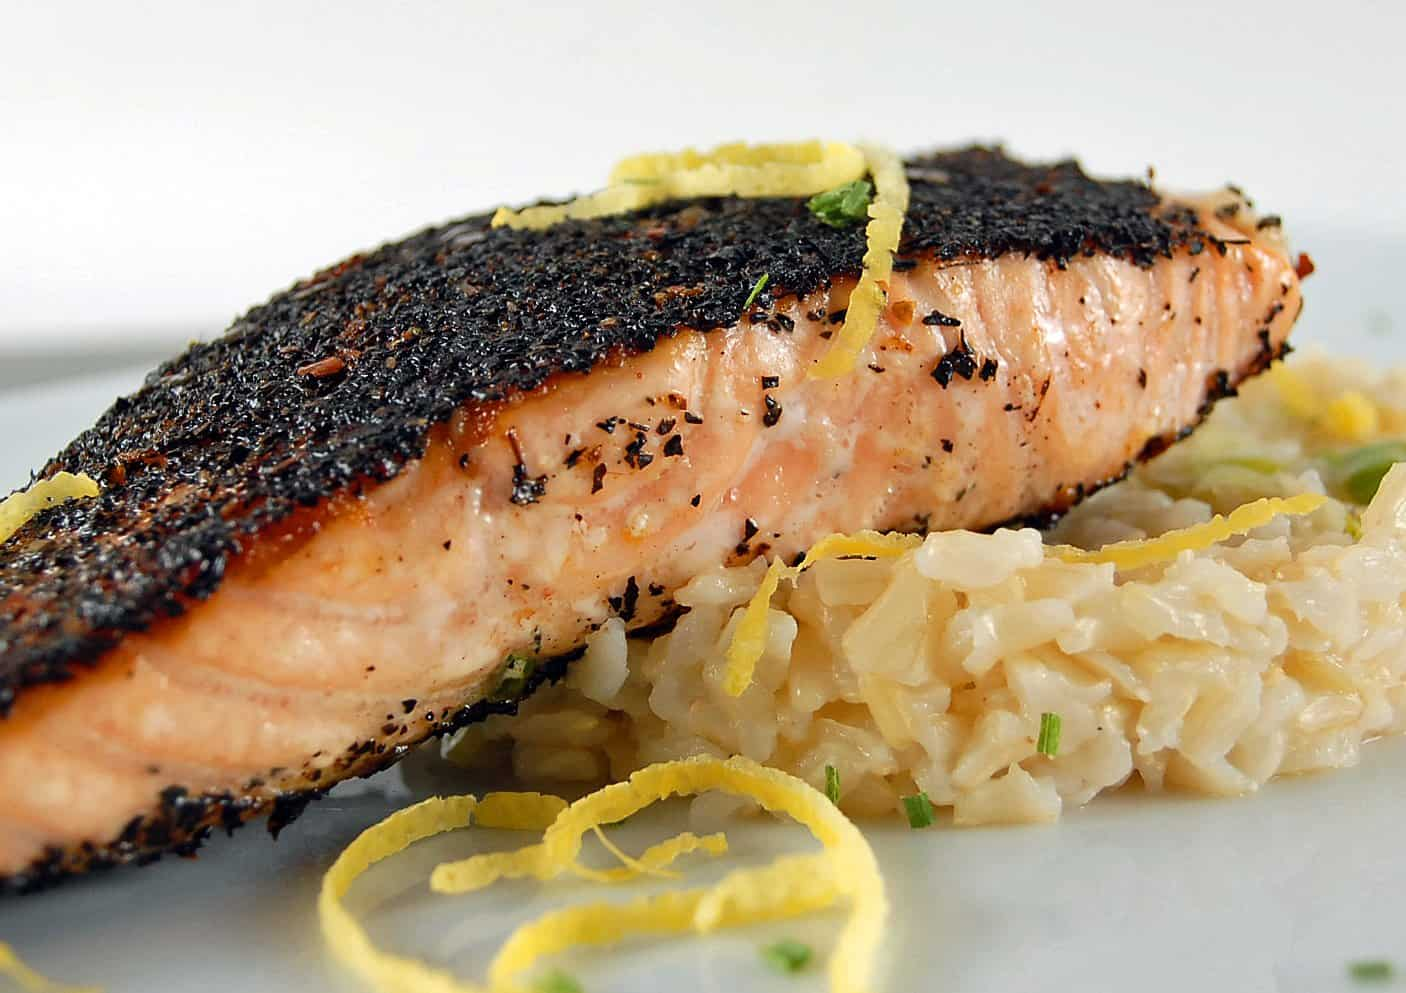 Tea-Rubbed Salmon with Lemon-Scallion Rice